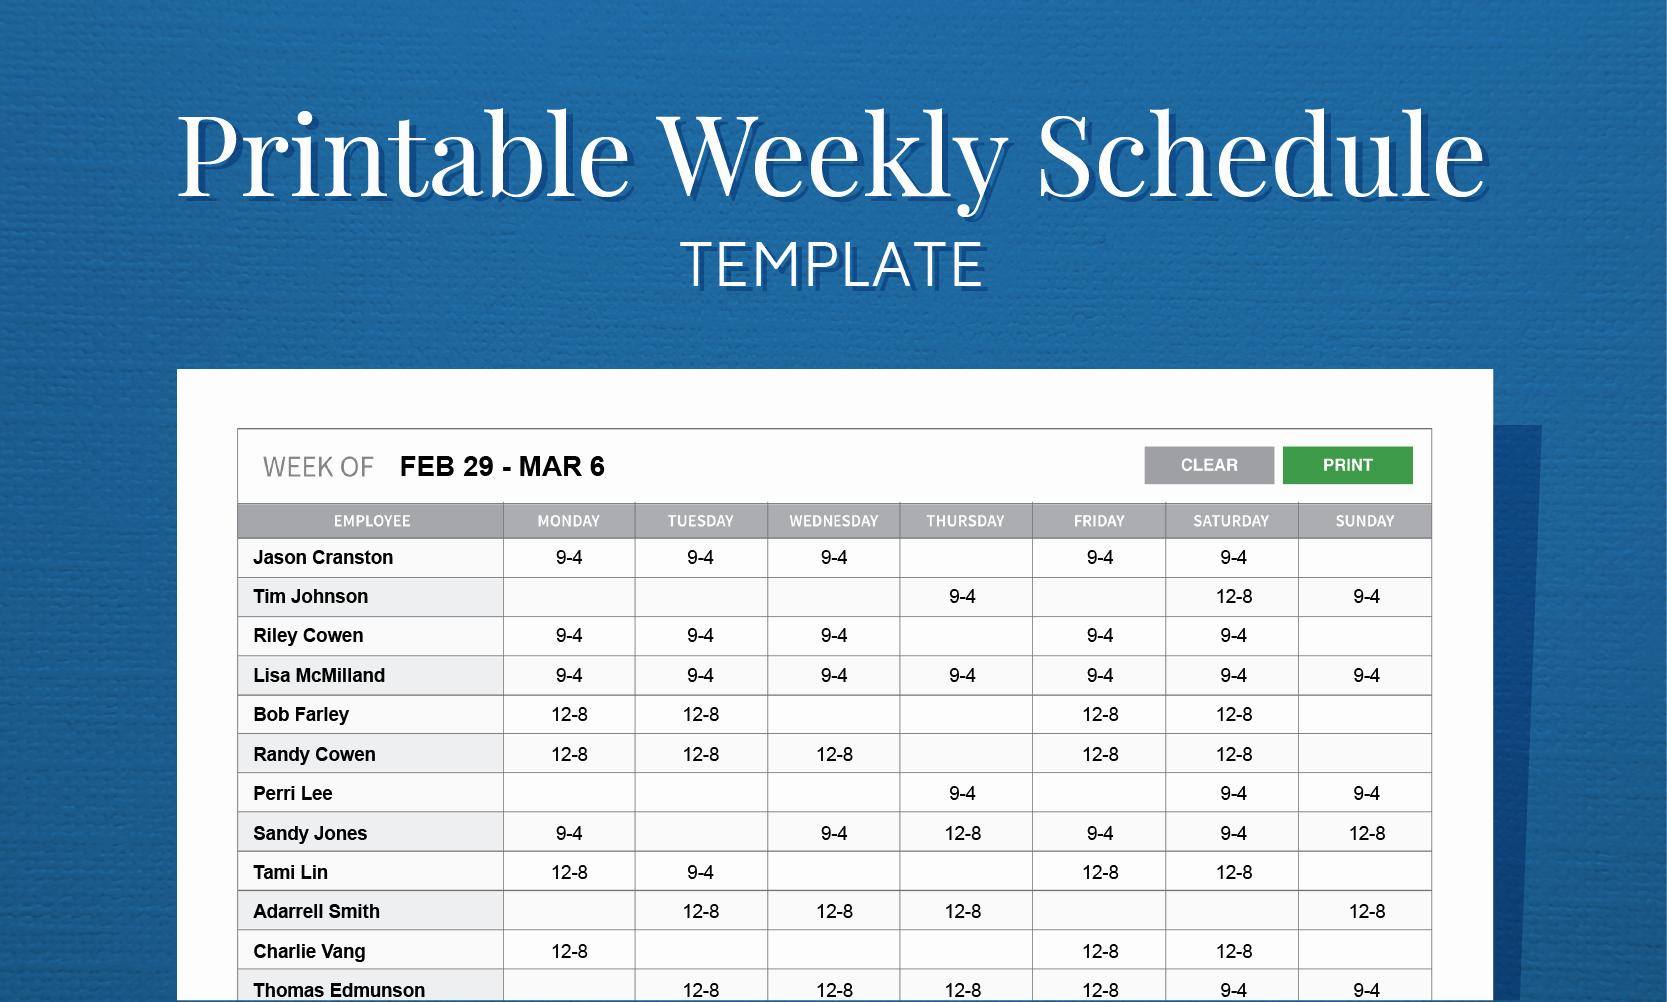 Work Schedule Template Excel Beautiful Free Printable Work Schedule Template for Employee